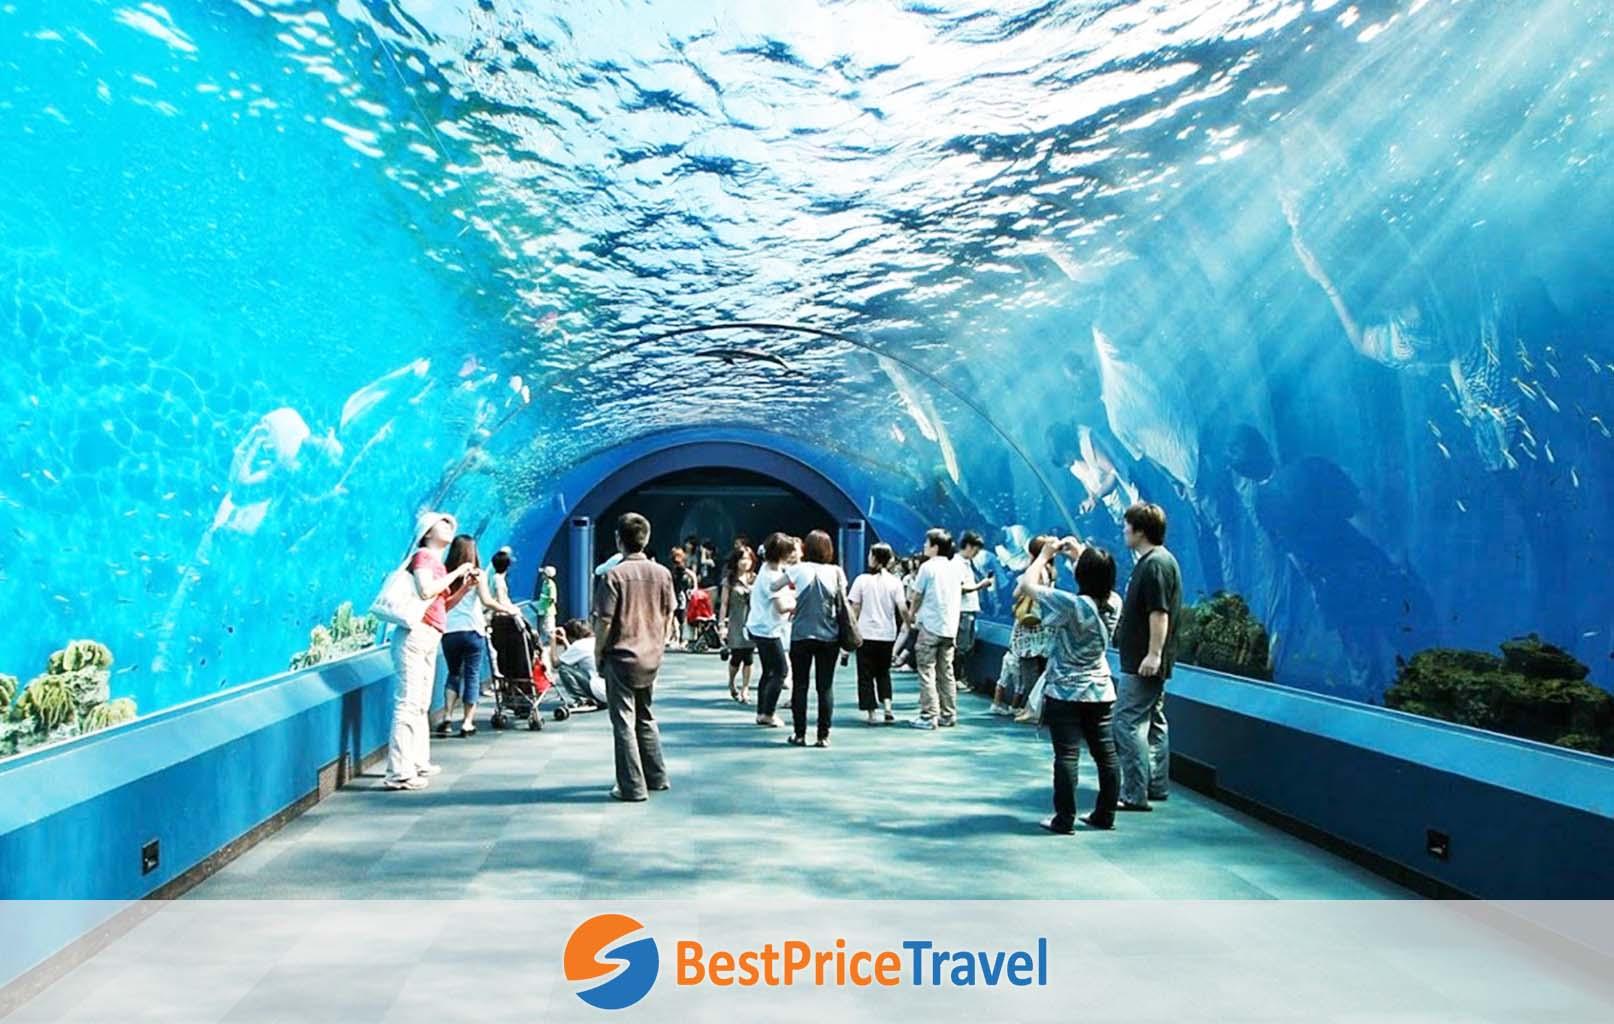 Thủy cung - Underwater World Pattaya